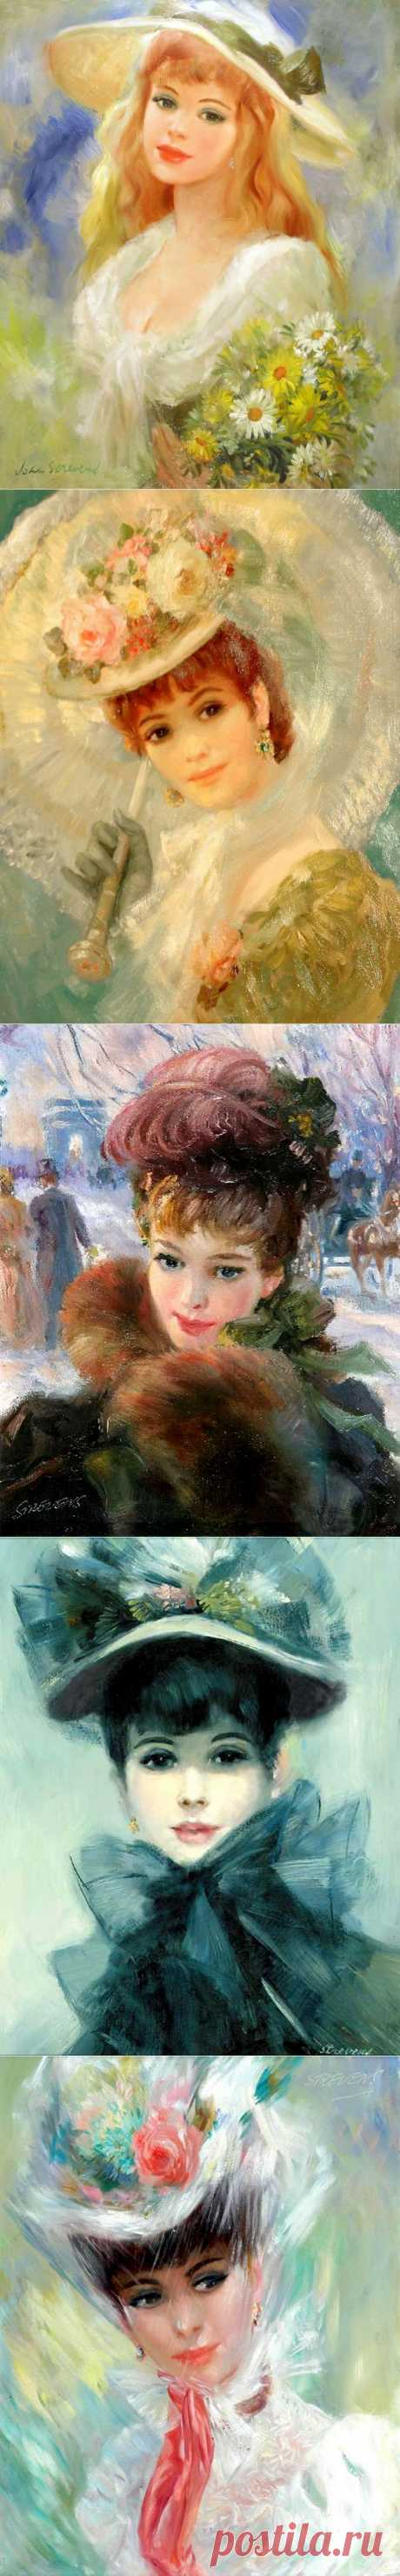 Британский художник Frederic John LLoyd Strevens (1902-1990)